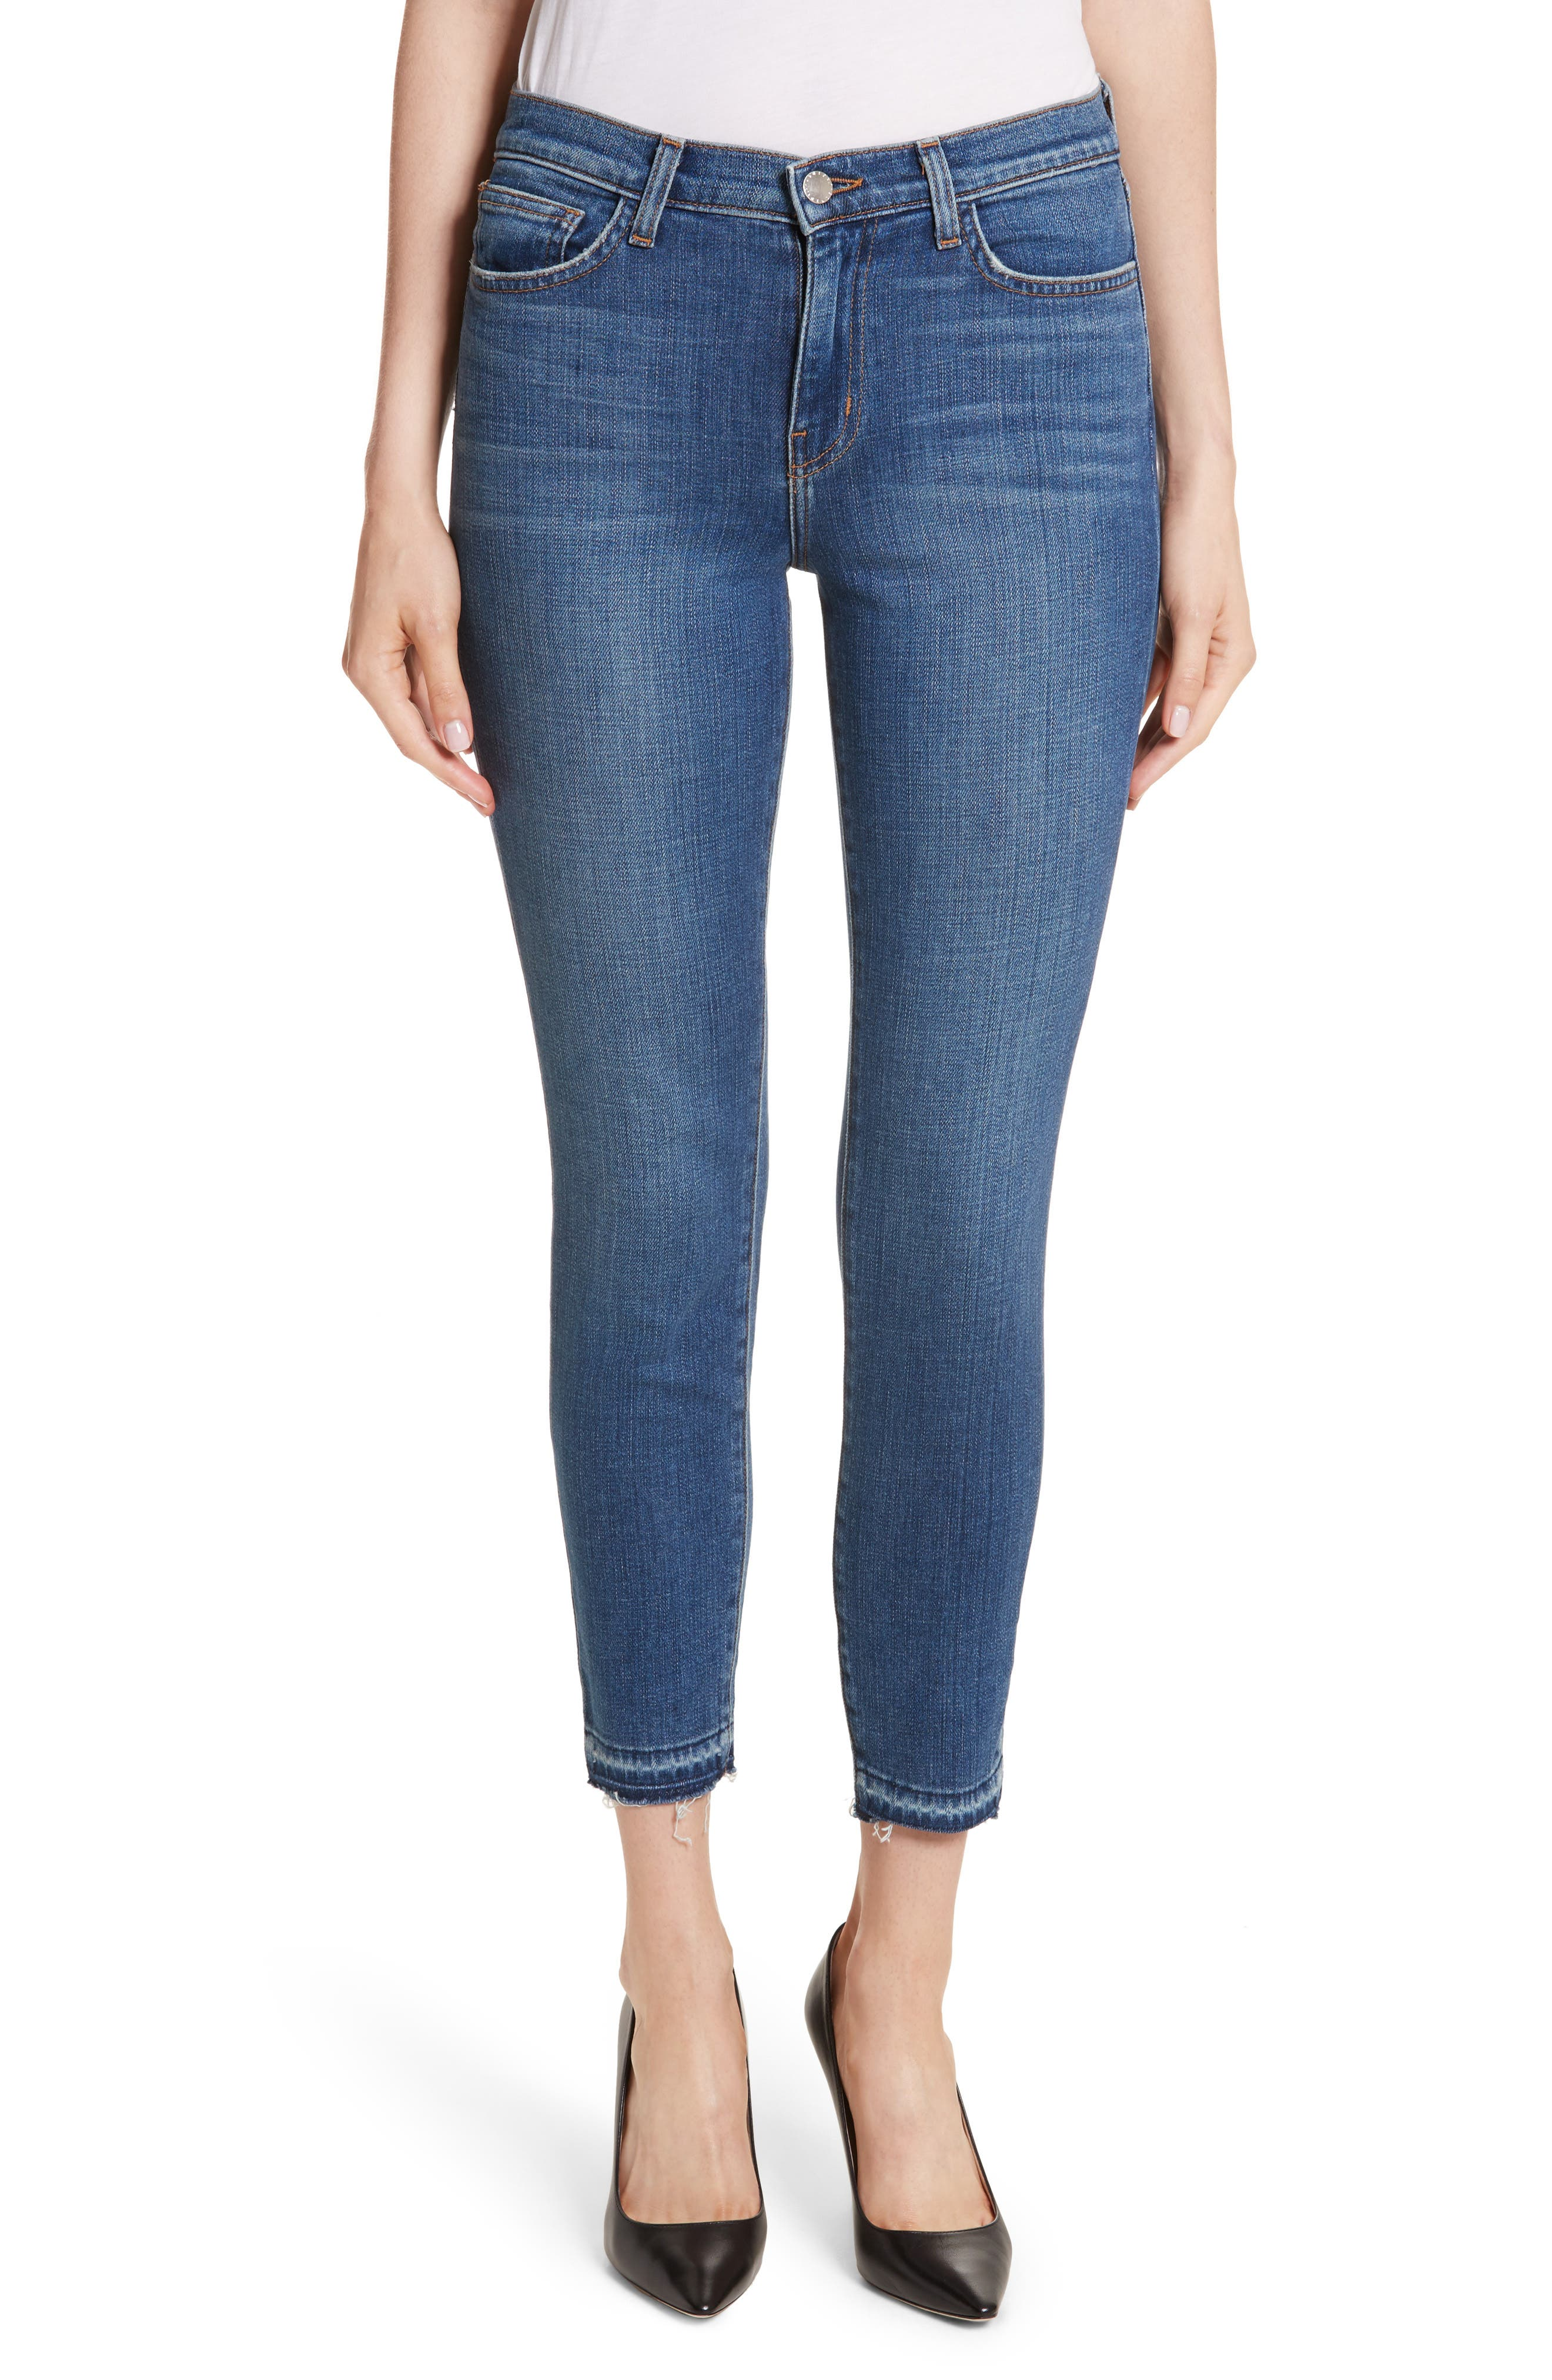 L'AGENCE Laguna French High Waist Release Hem Jeans